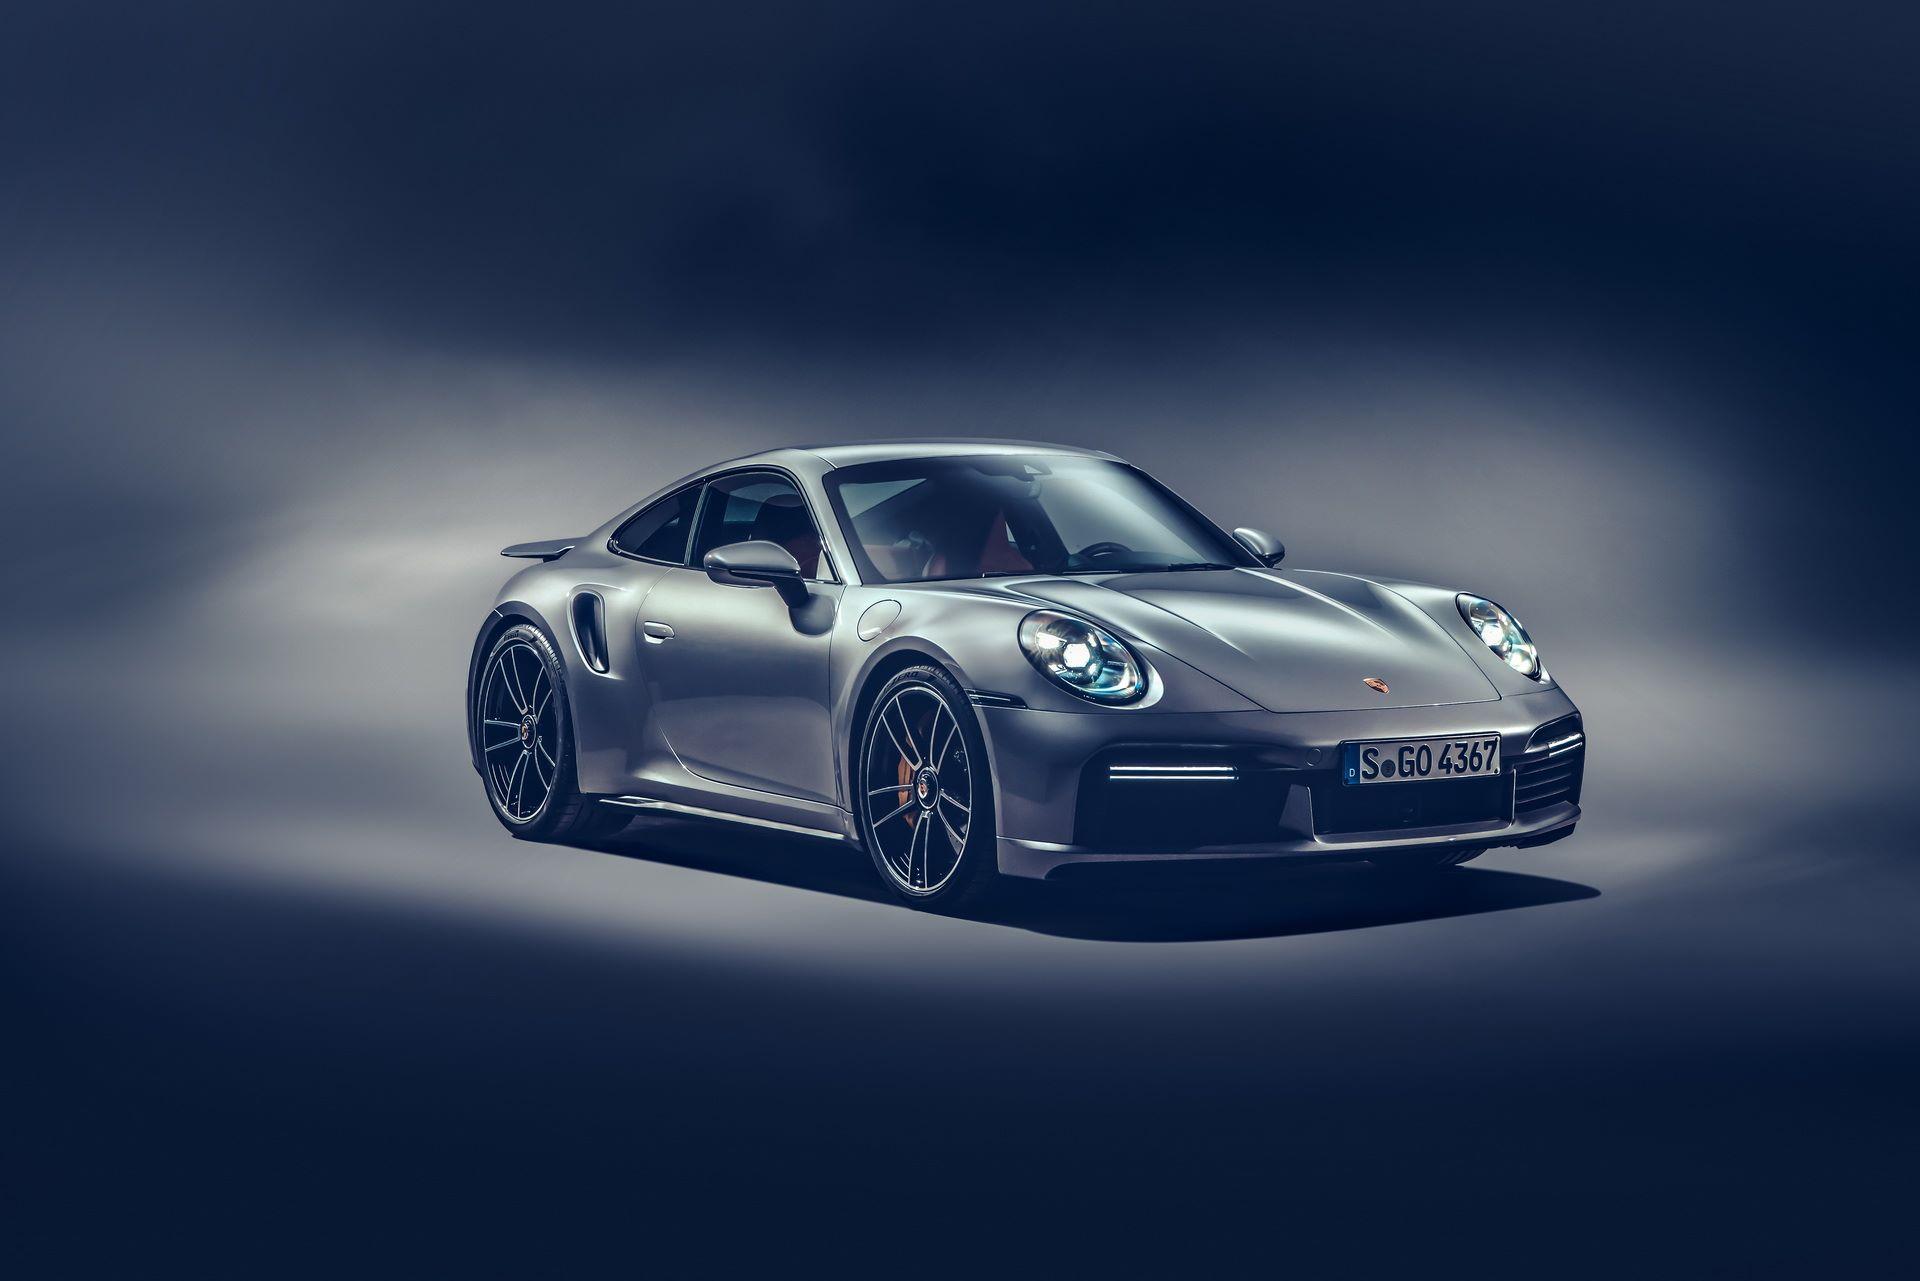 Porsche-911-Turbo-S-2020-17